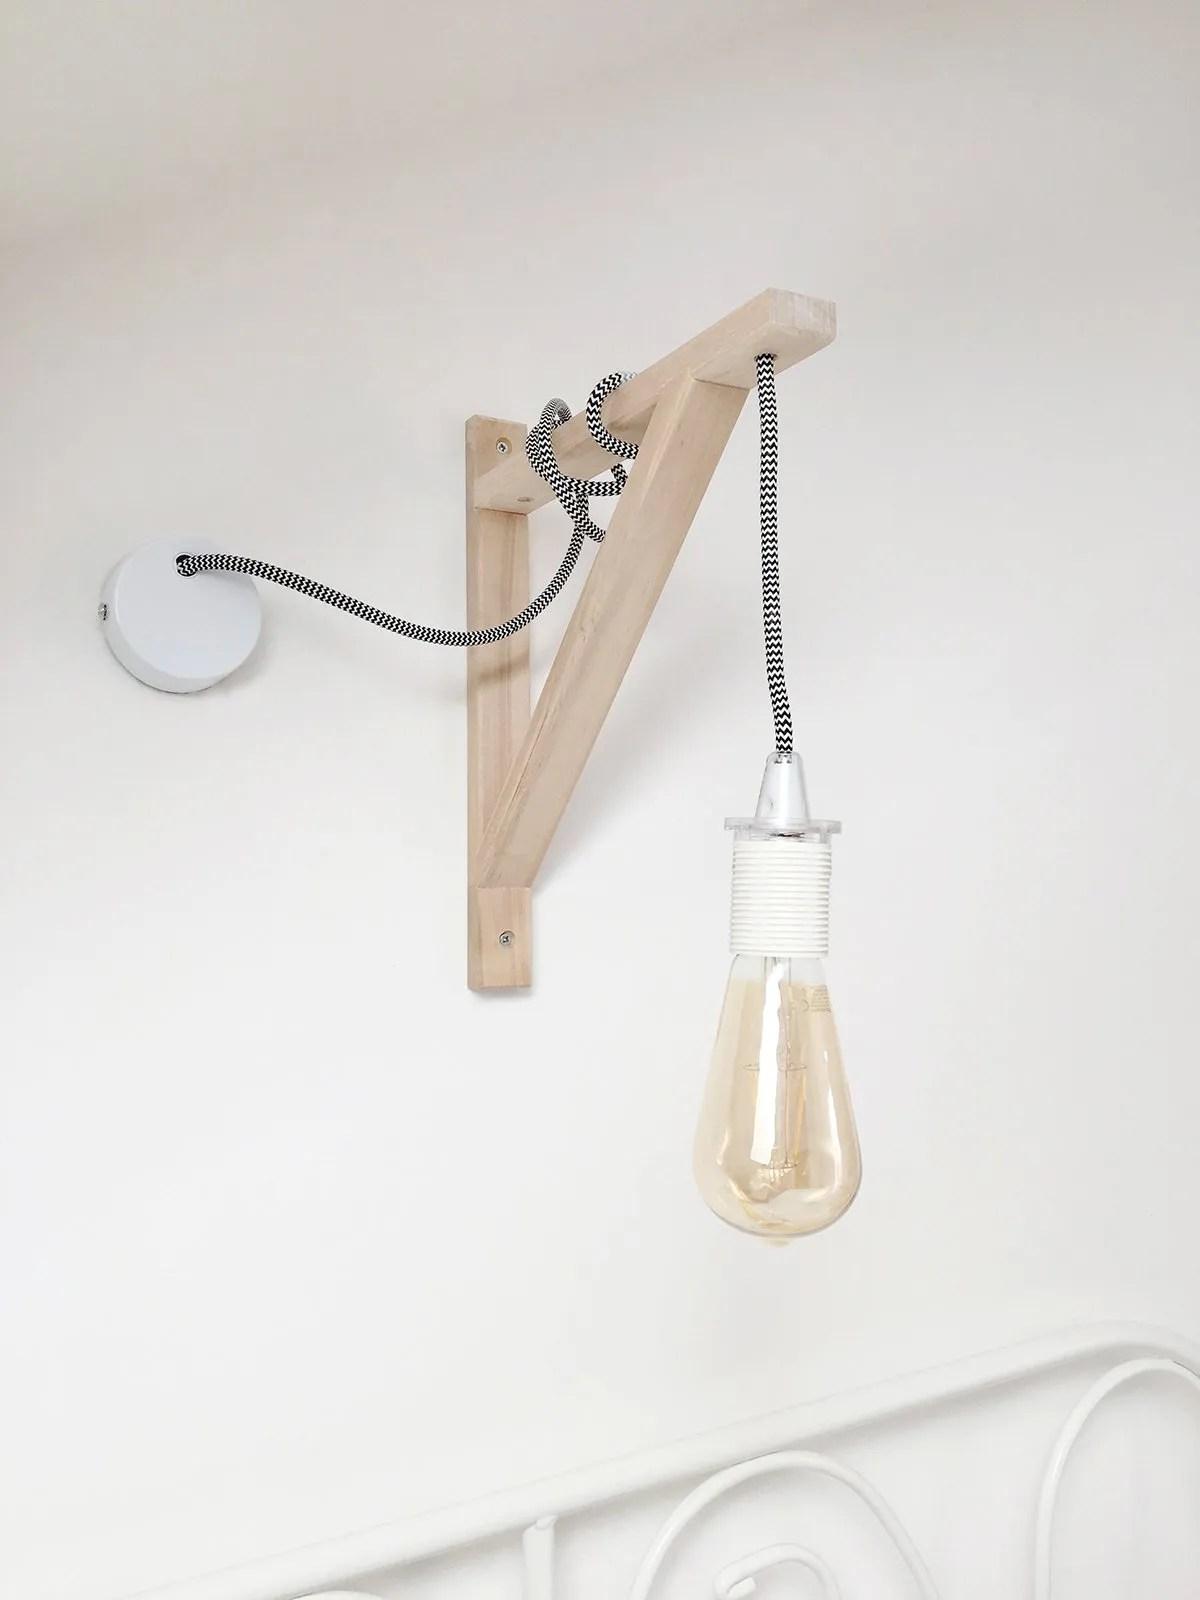 DIY // WALL LAMP WITH HANGING LIGHTBULB